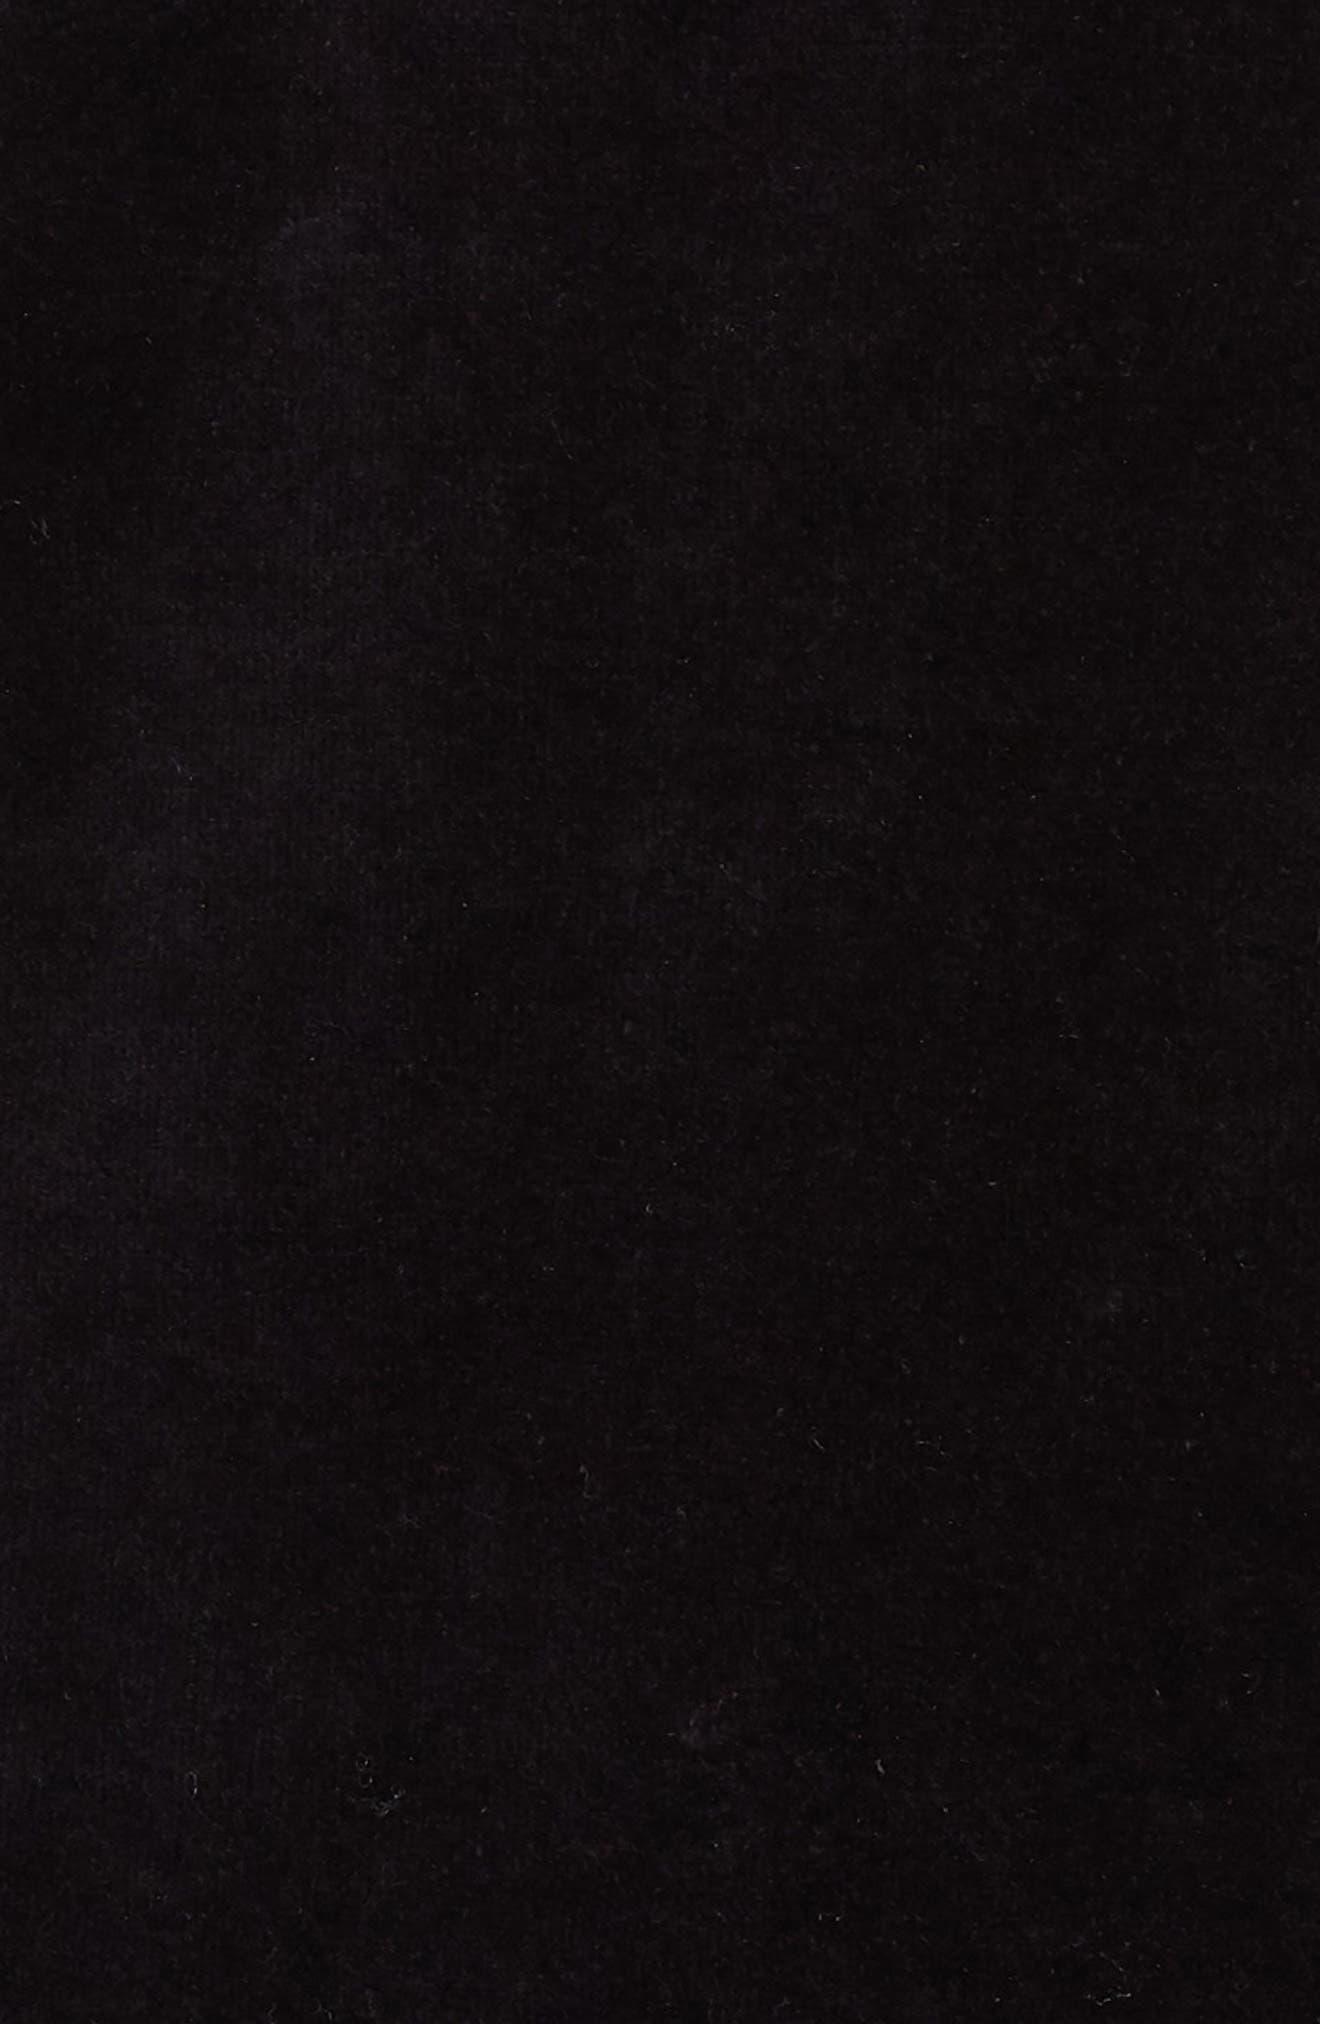 Velour Crewneck Sweater,                             Alternate thumbnail 6, color,                             BLACK/ CRIMSON